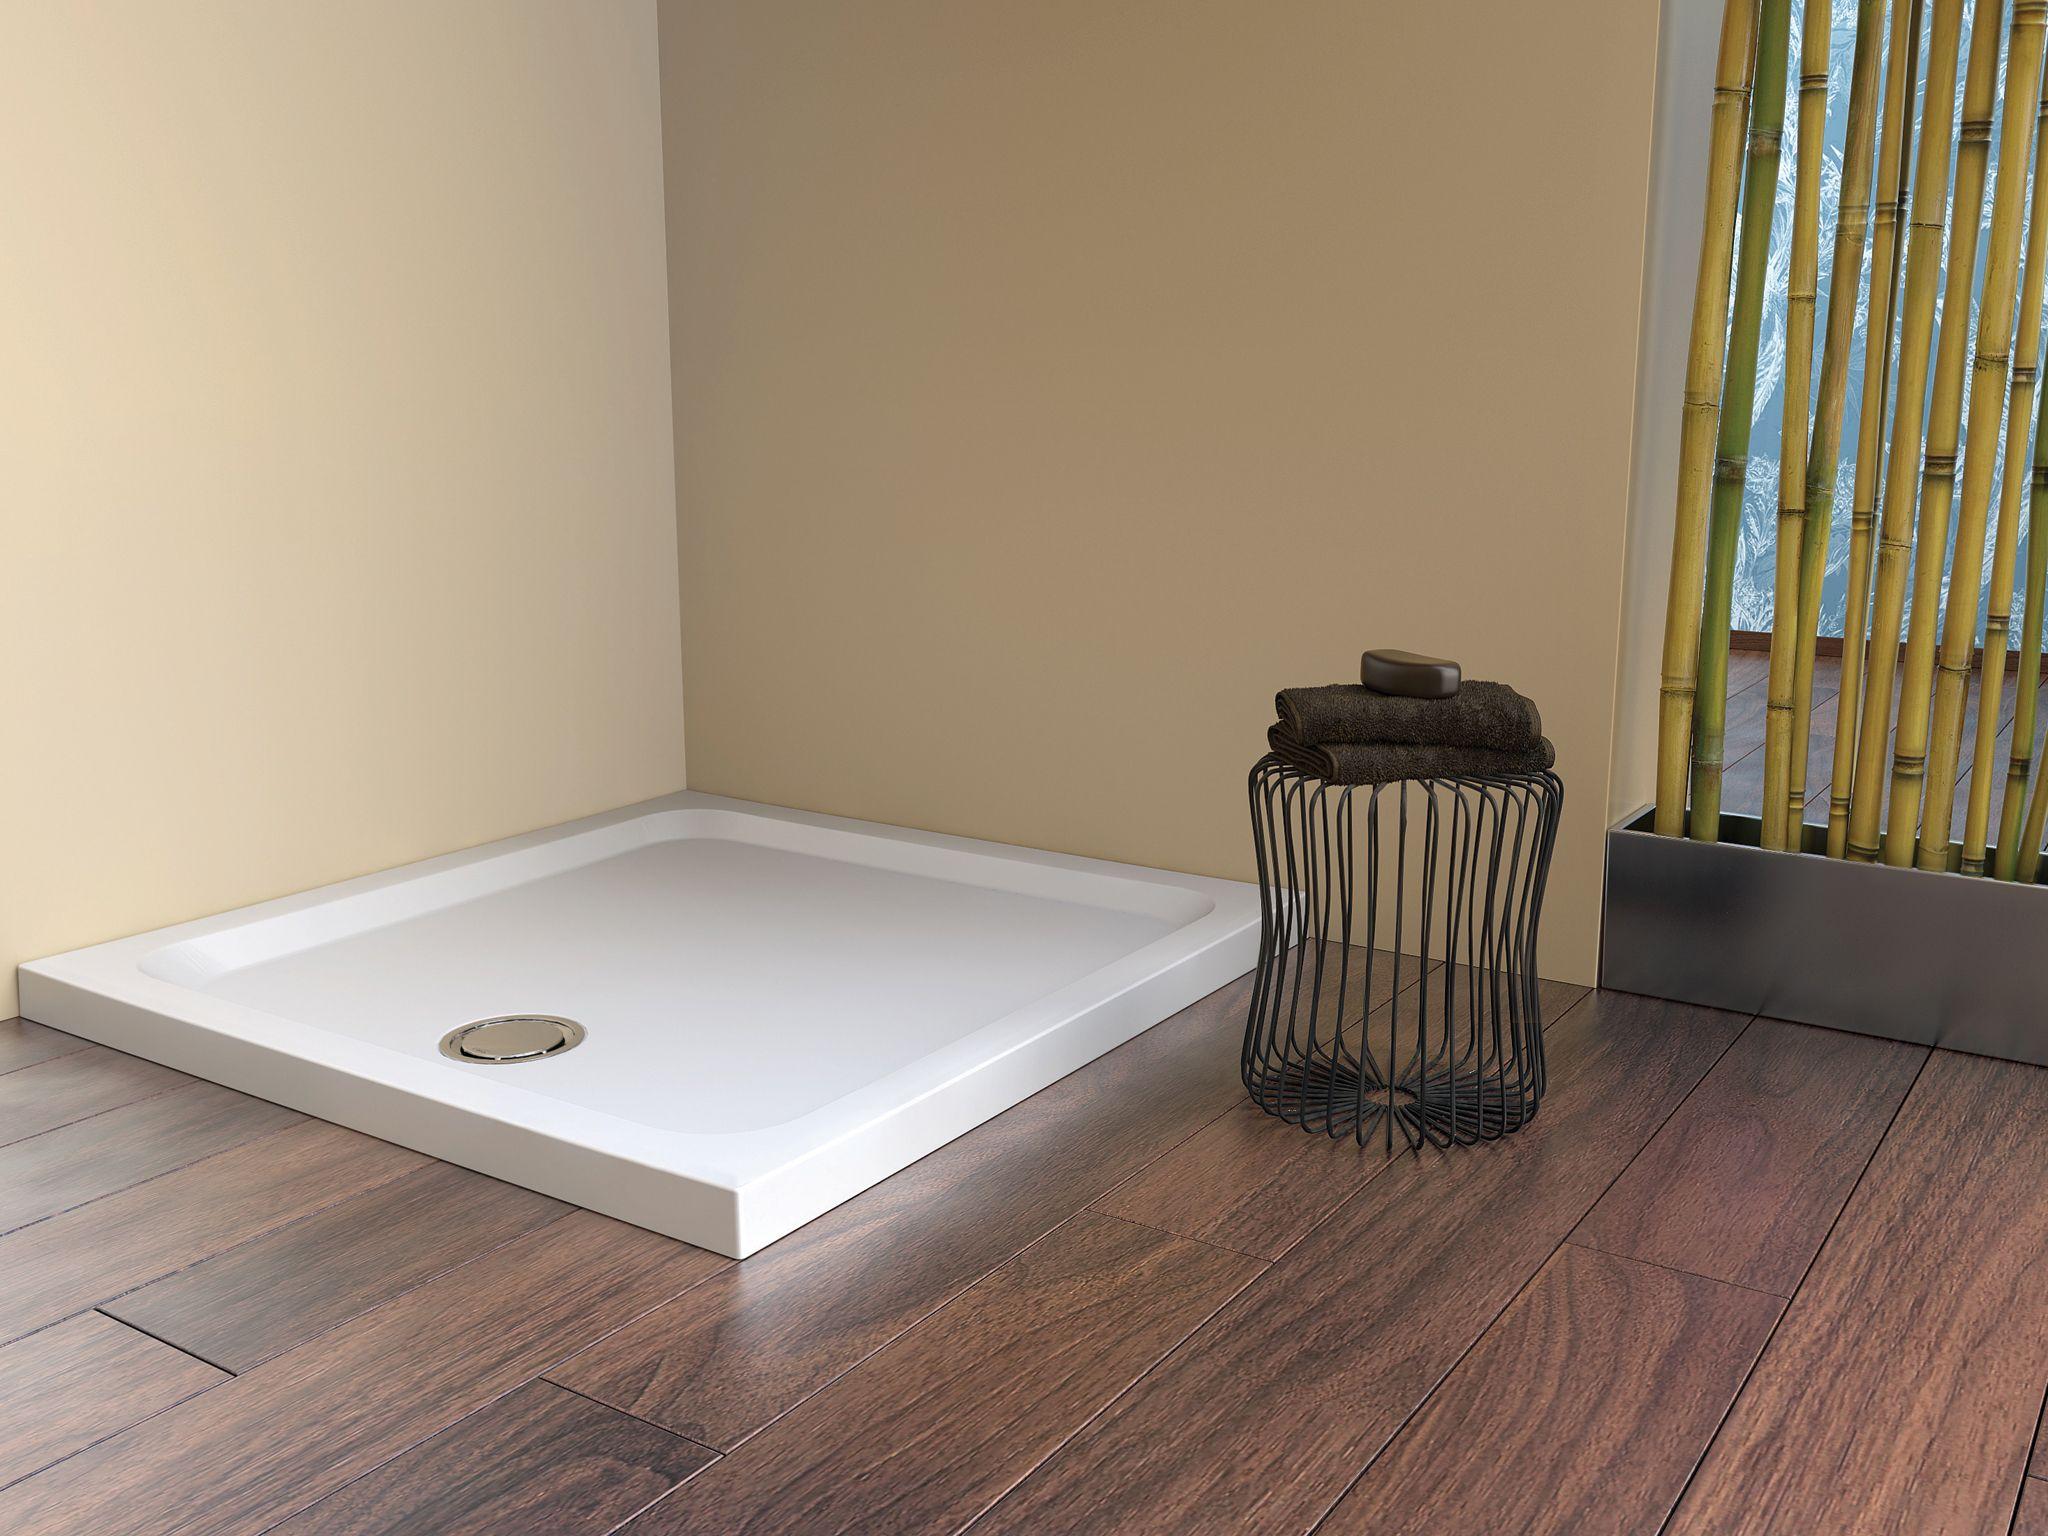 Fineline 60 Shower Trays | Comfort Height Toilets | Pinterest ...